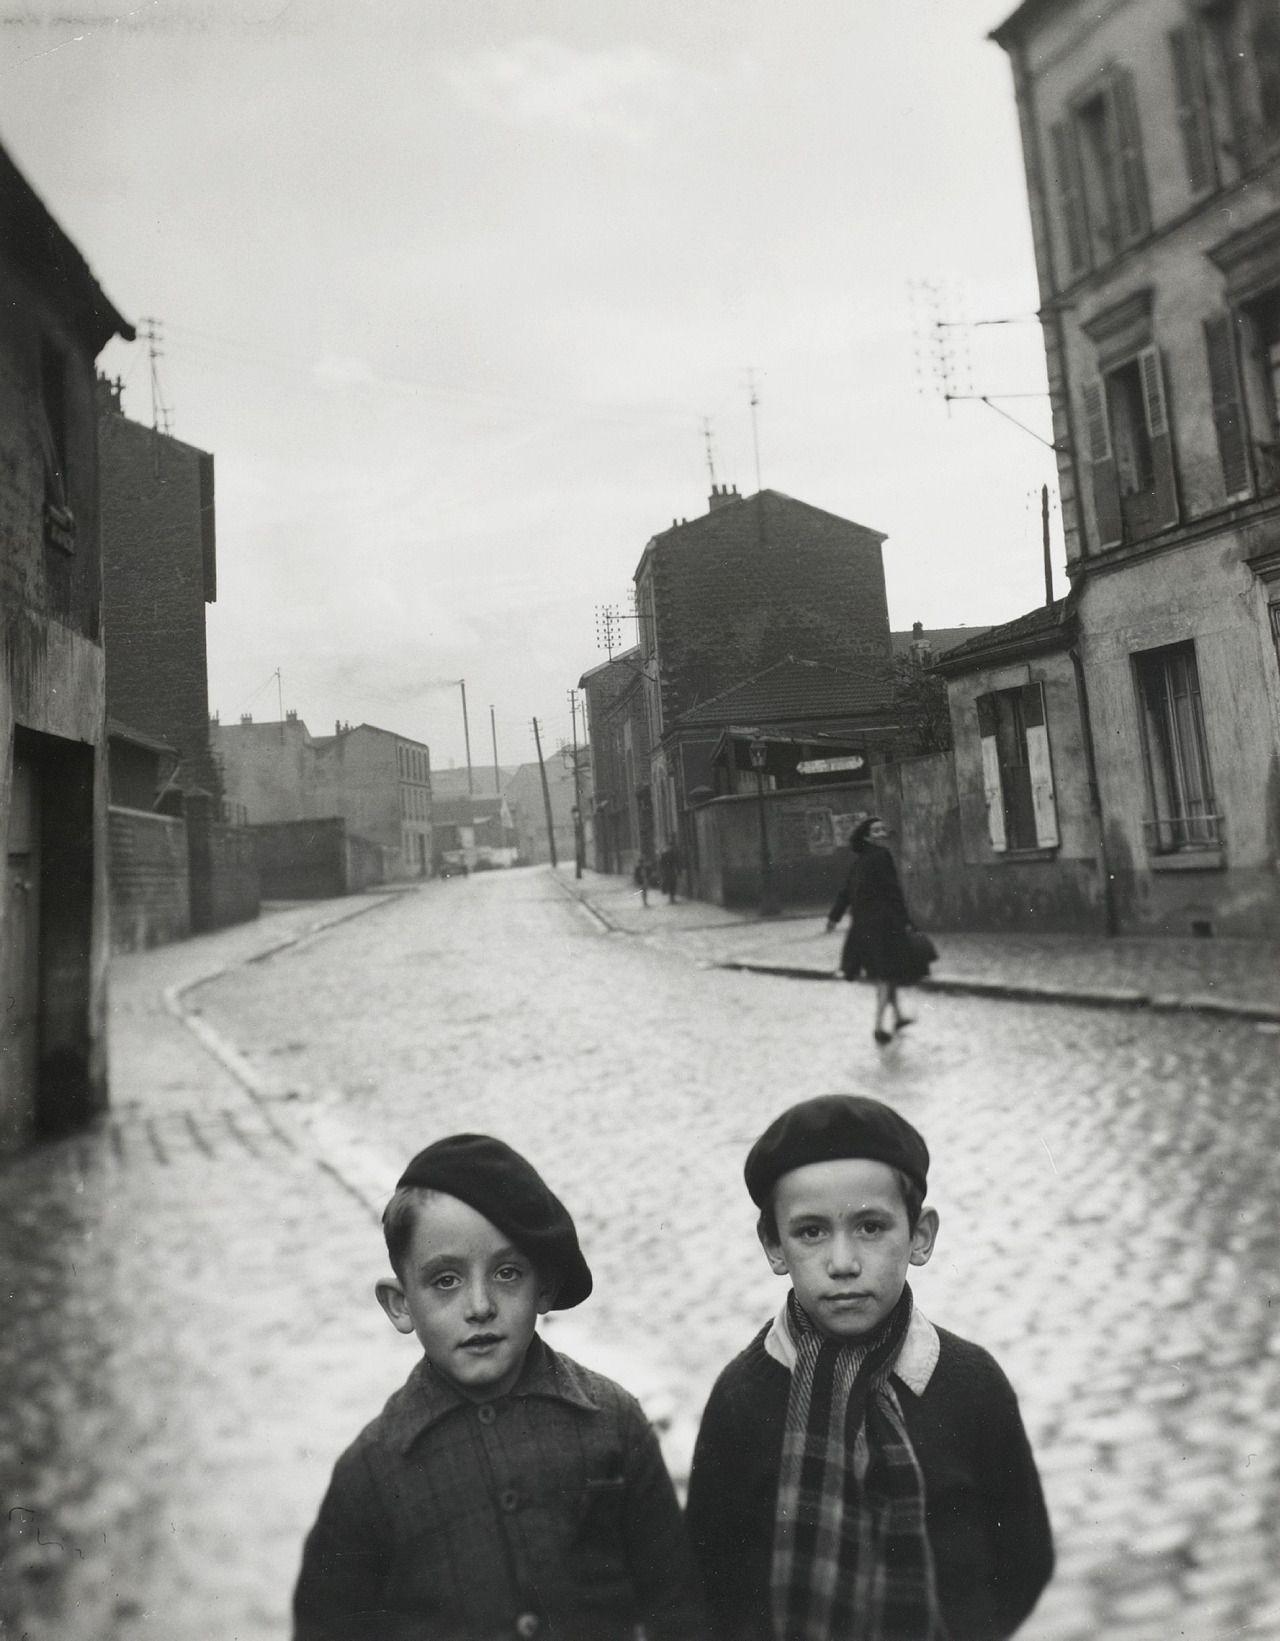 Louis Stettner: Aubervilliers, France, 1947